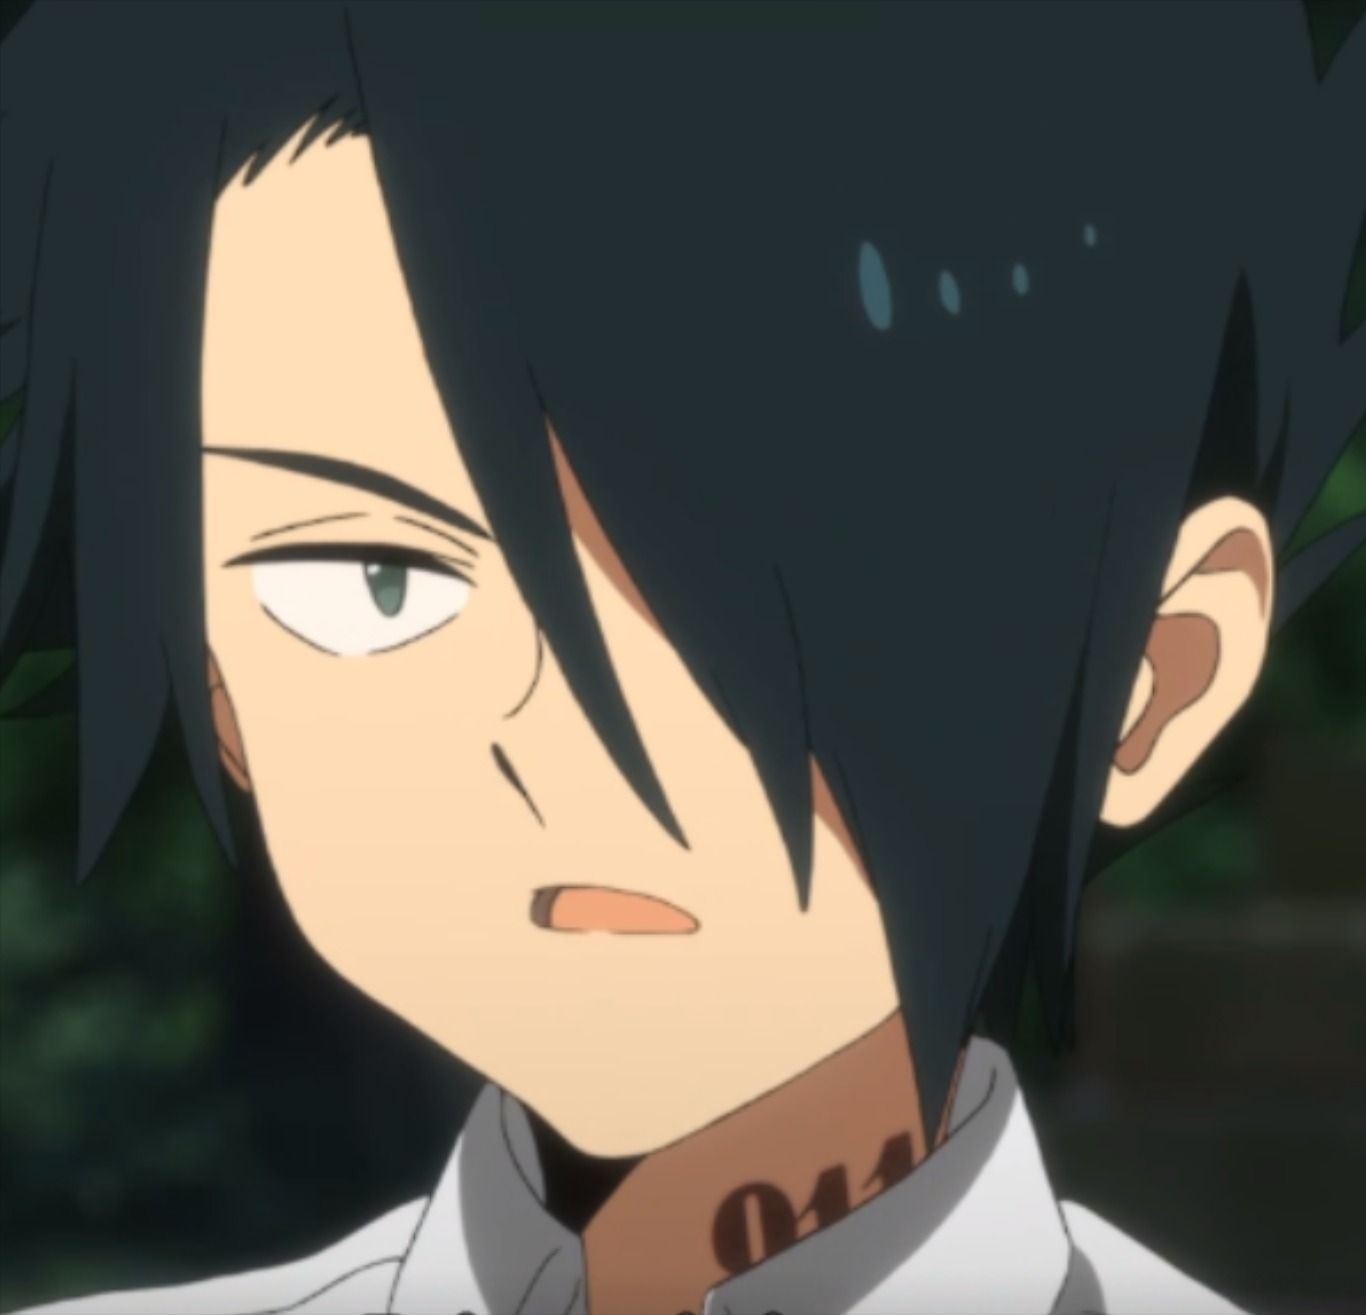 𝑹𝒂𝒚 Neverland Aesthetic Anime Anime Icons